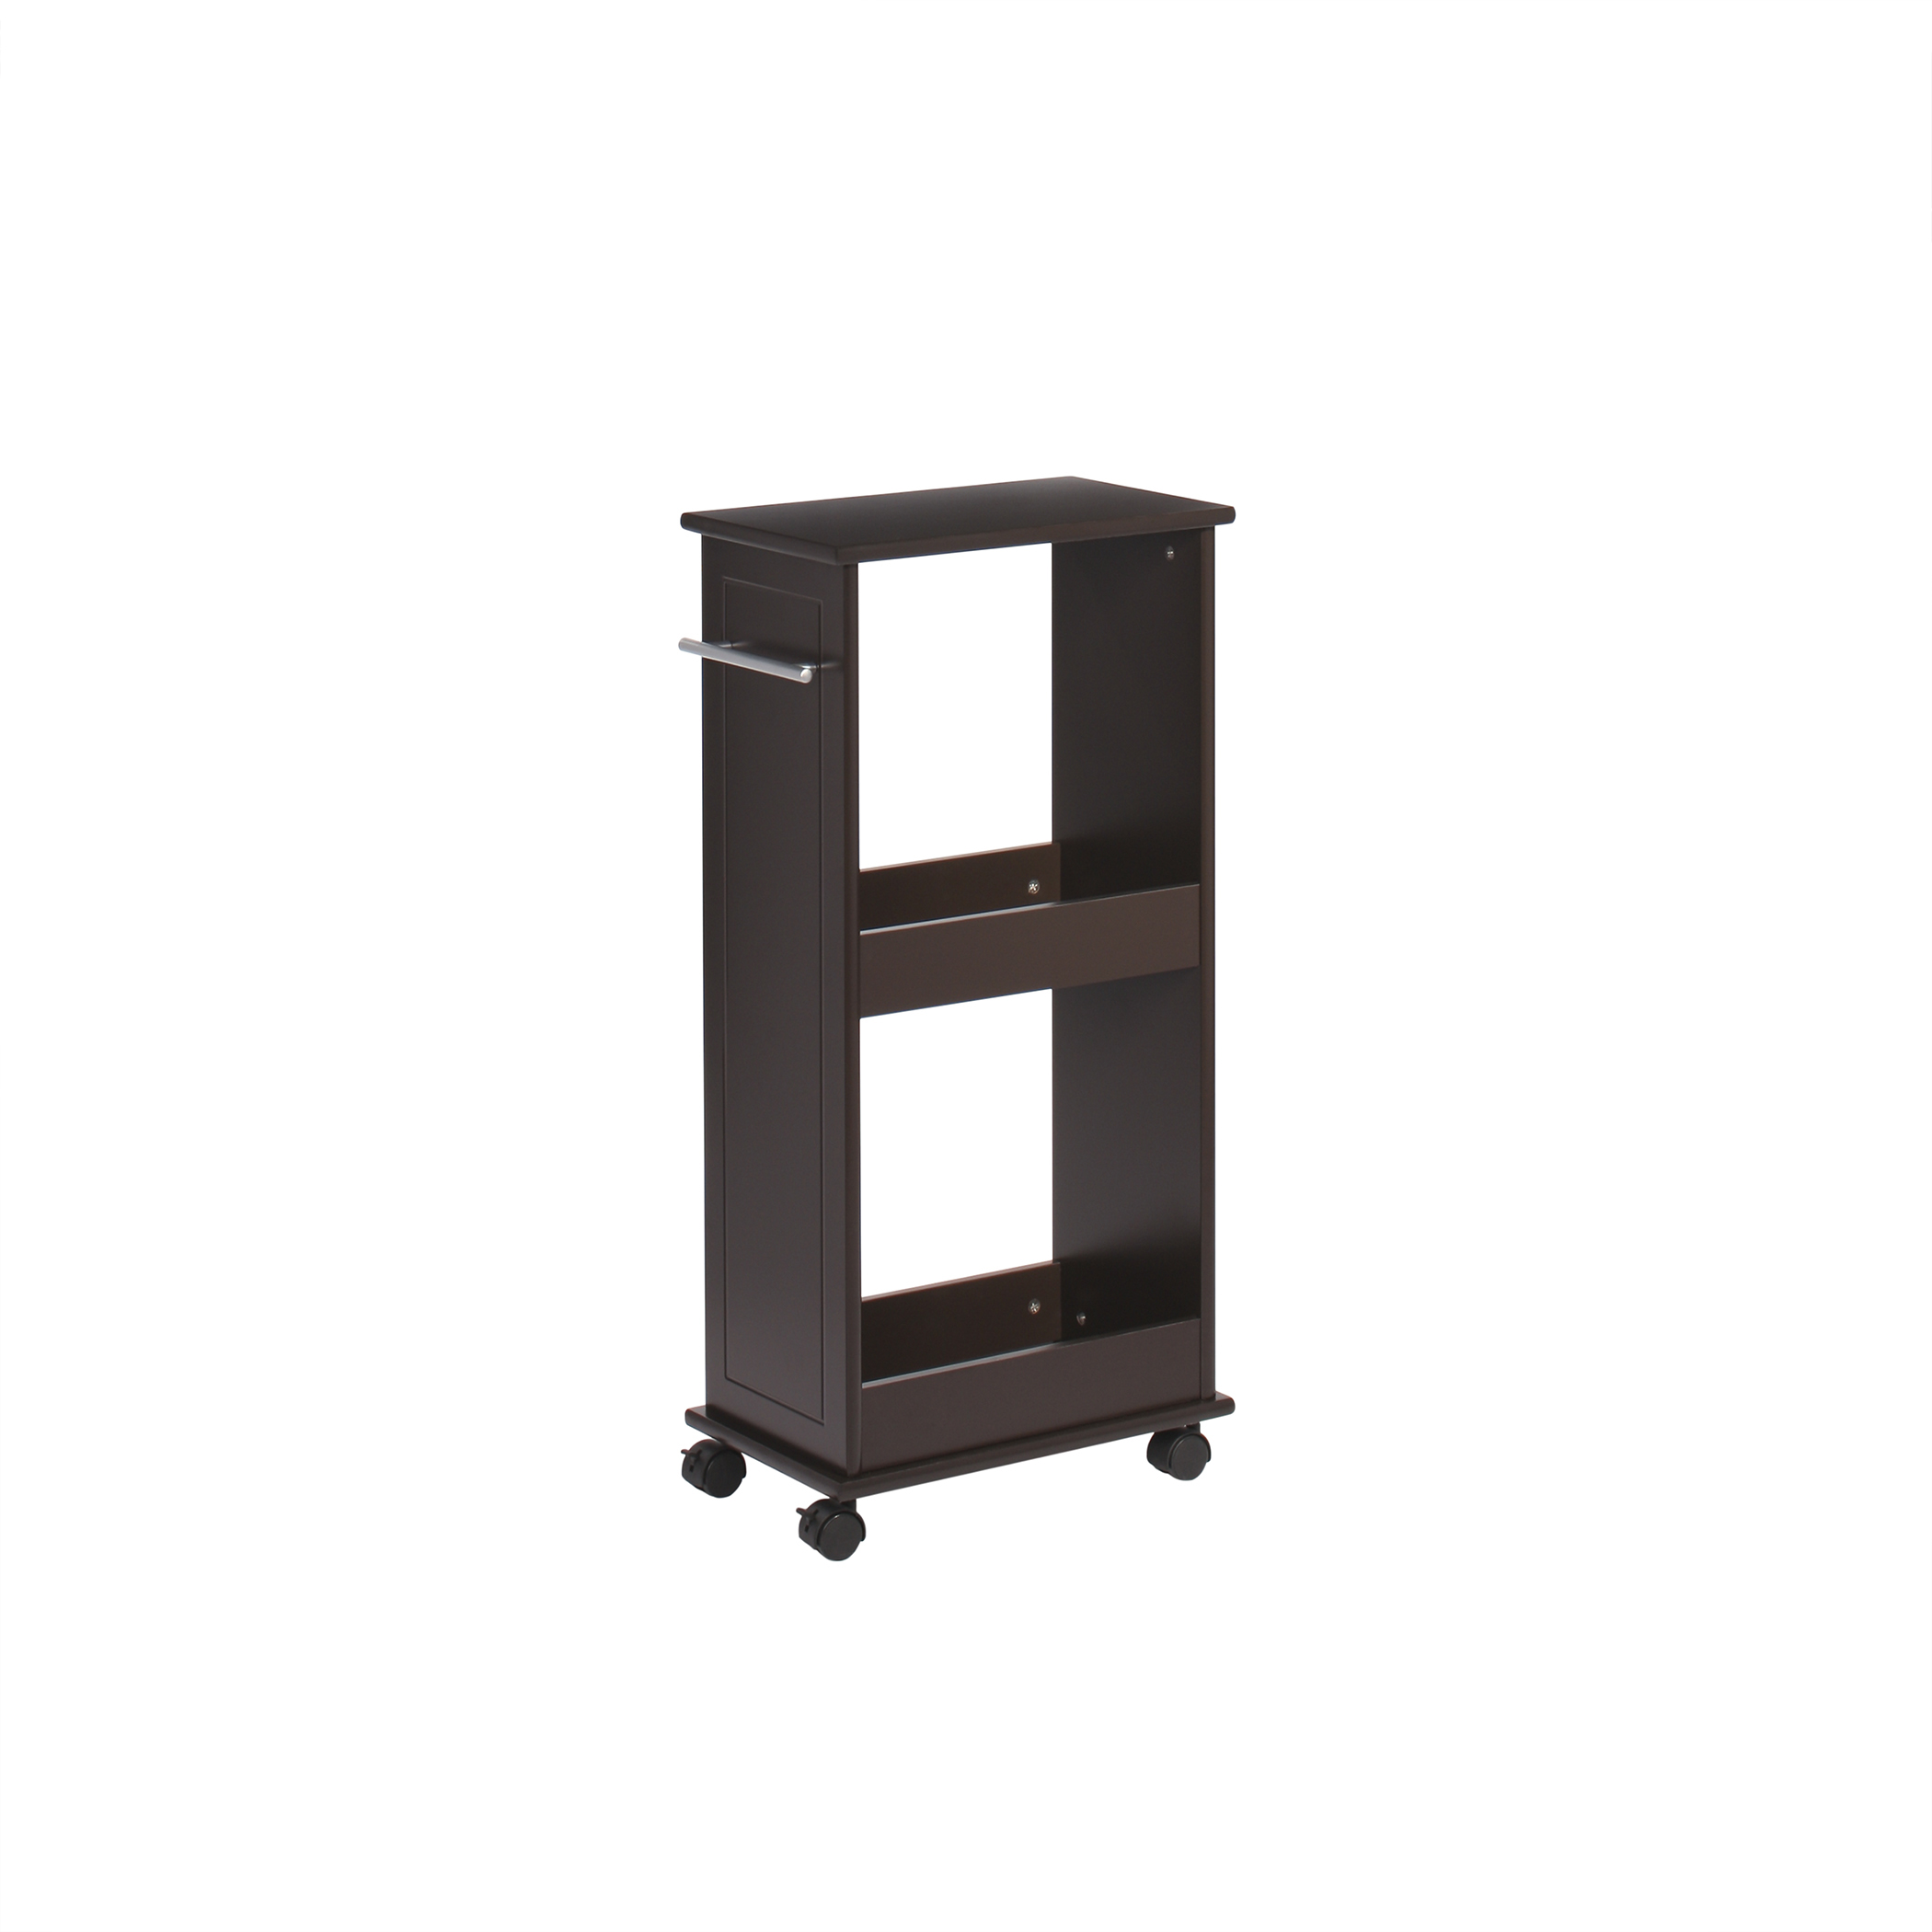 RiverRidge Rolling Cabinet with Shelves, Espresso